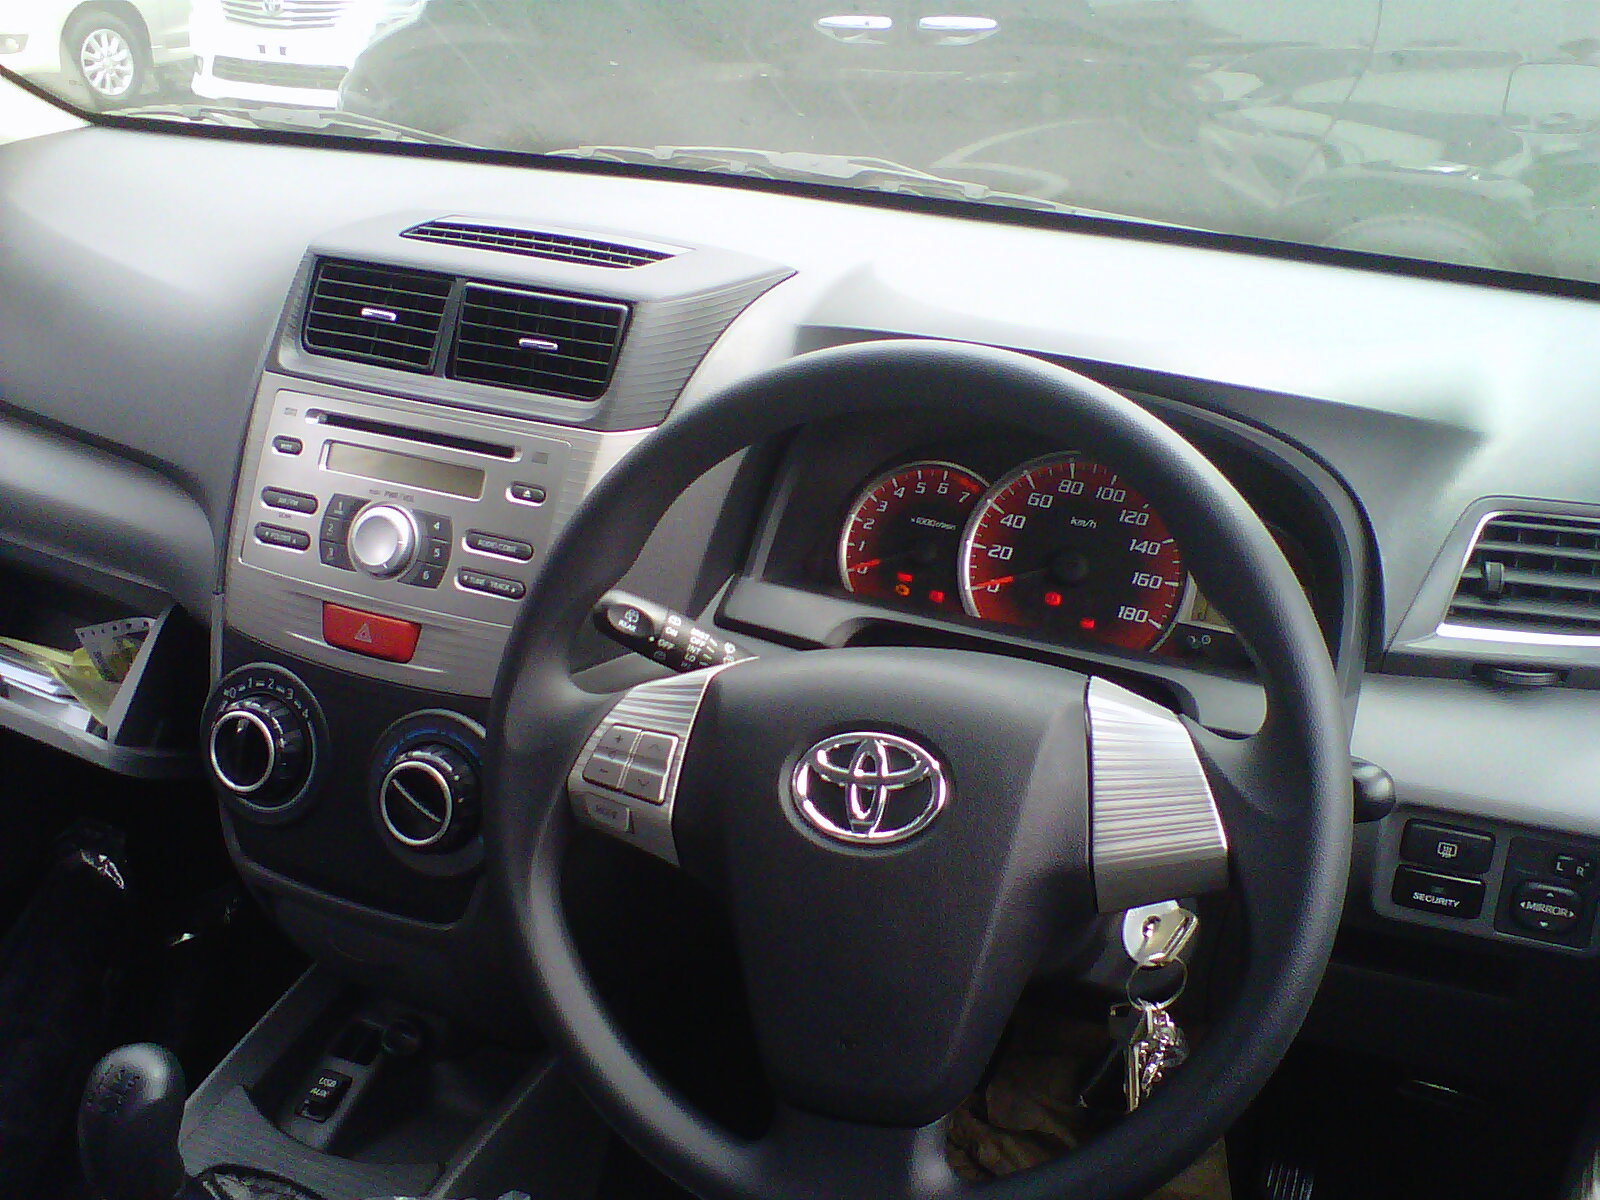 Grand New Avanza Bahan Bakar Tipe E Abs Plaza Toyota Kyai Tapa All